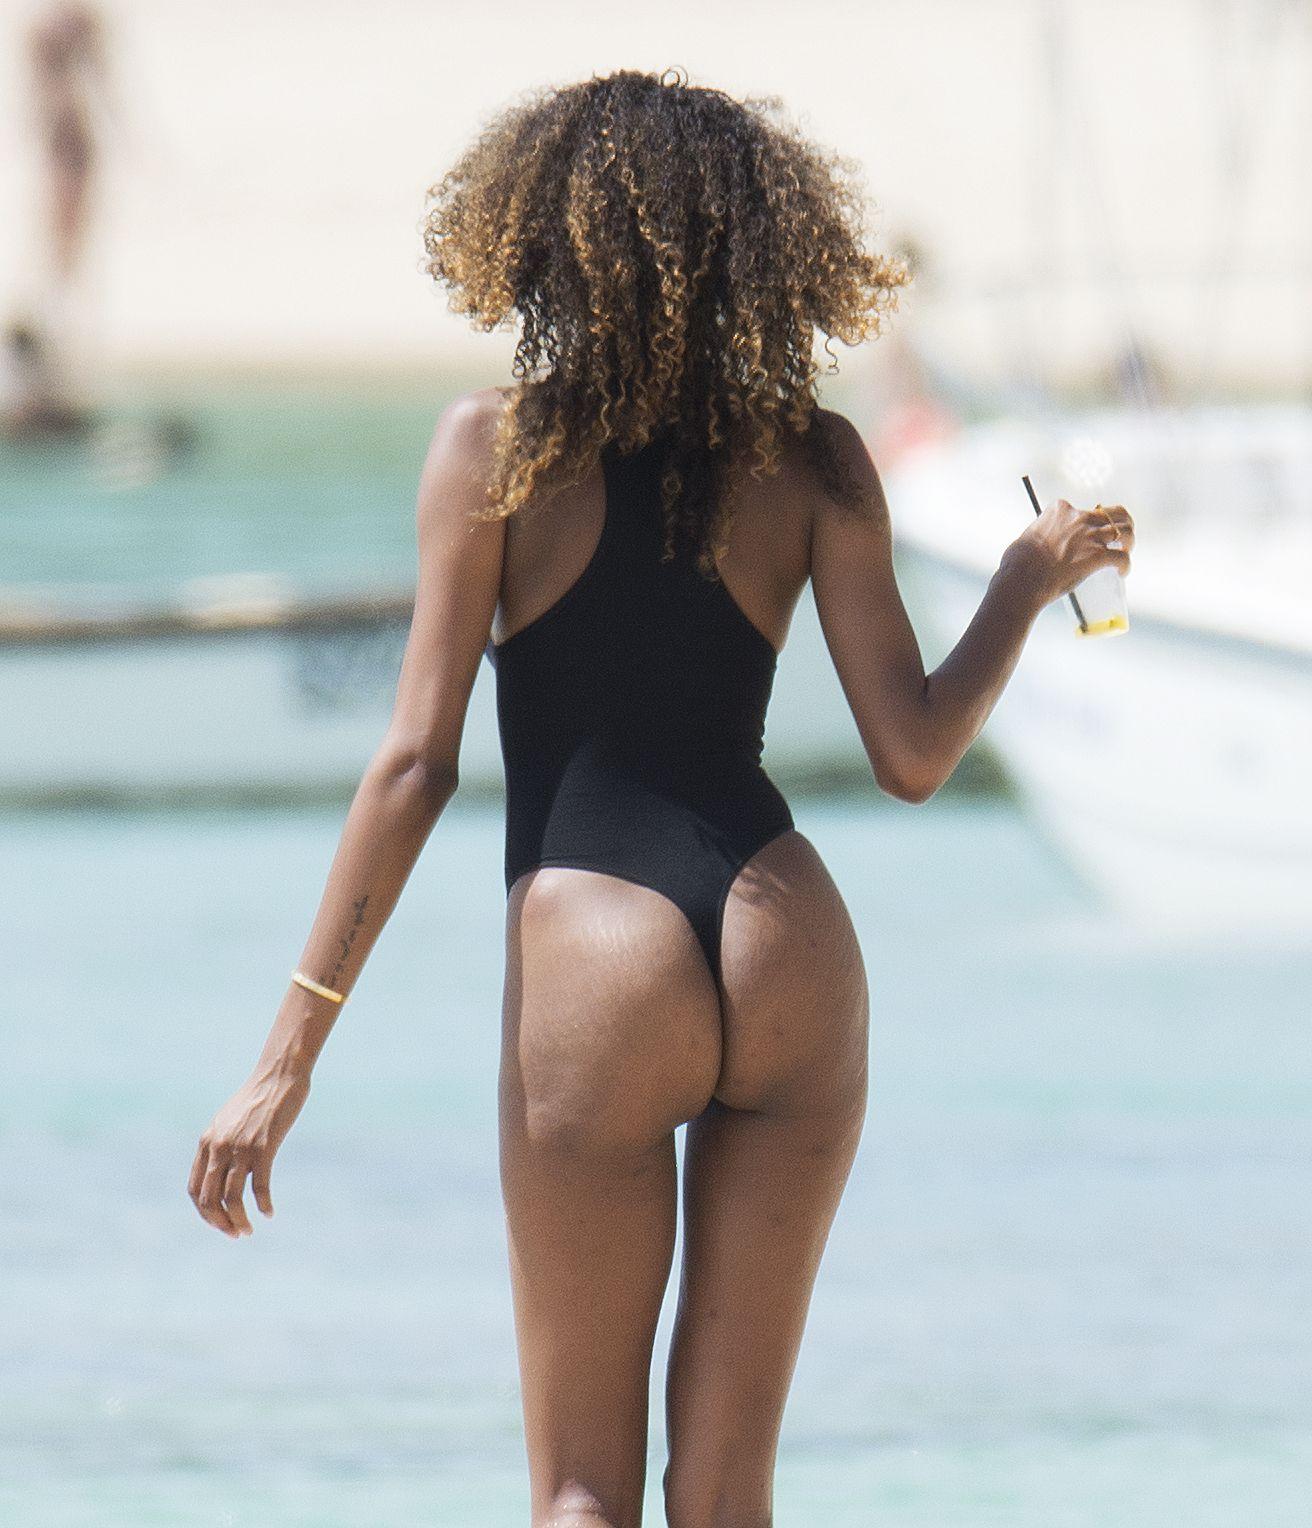 Jourdan Dunn in a Swimsuit (6 Photos)